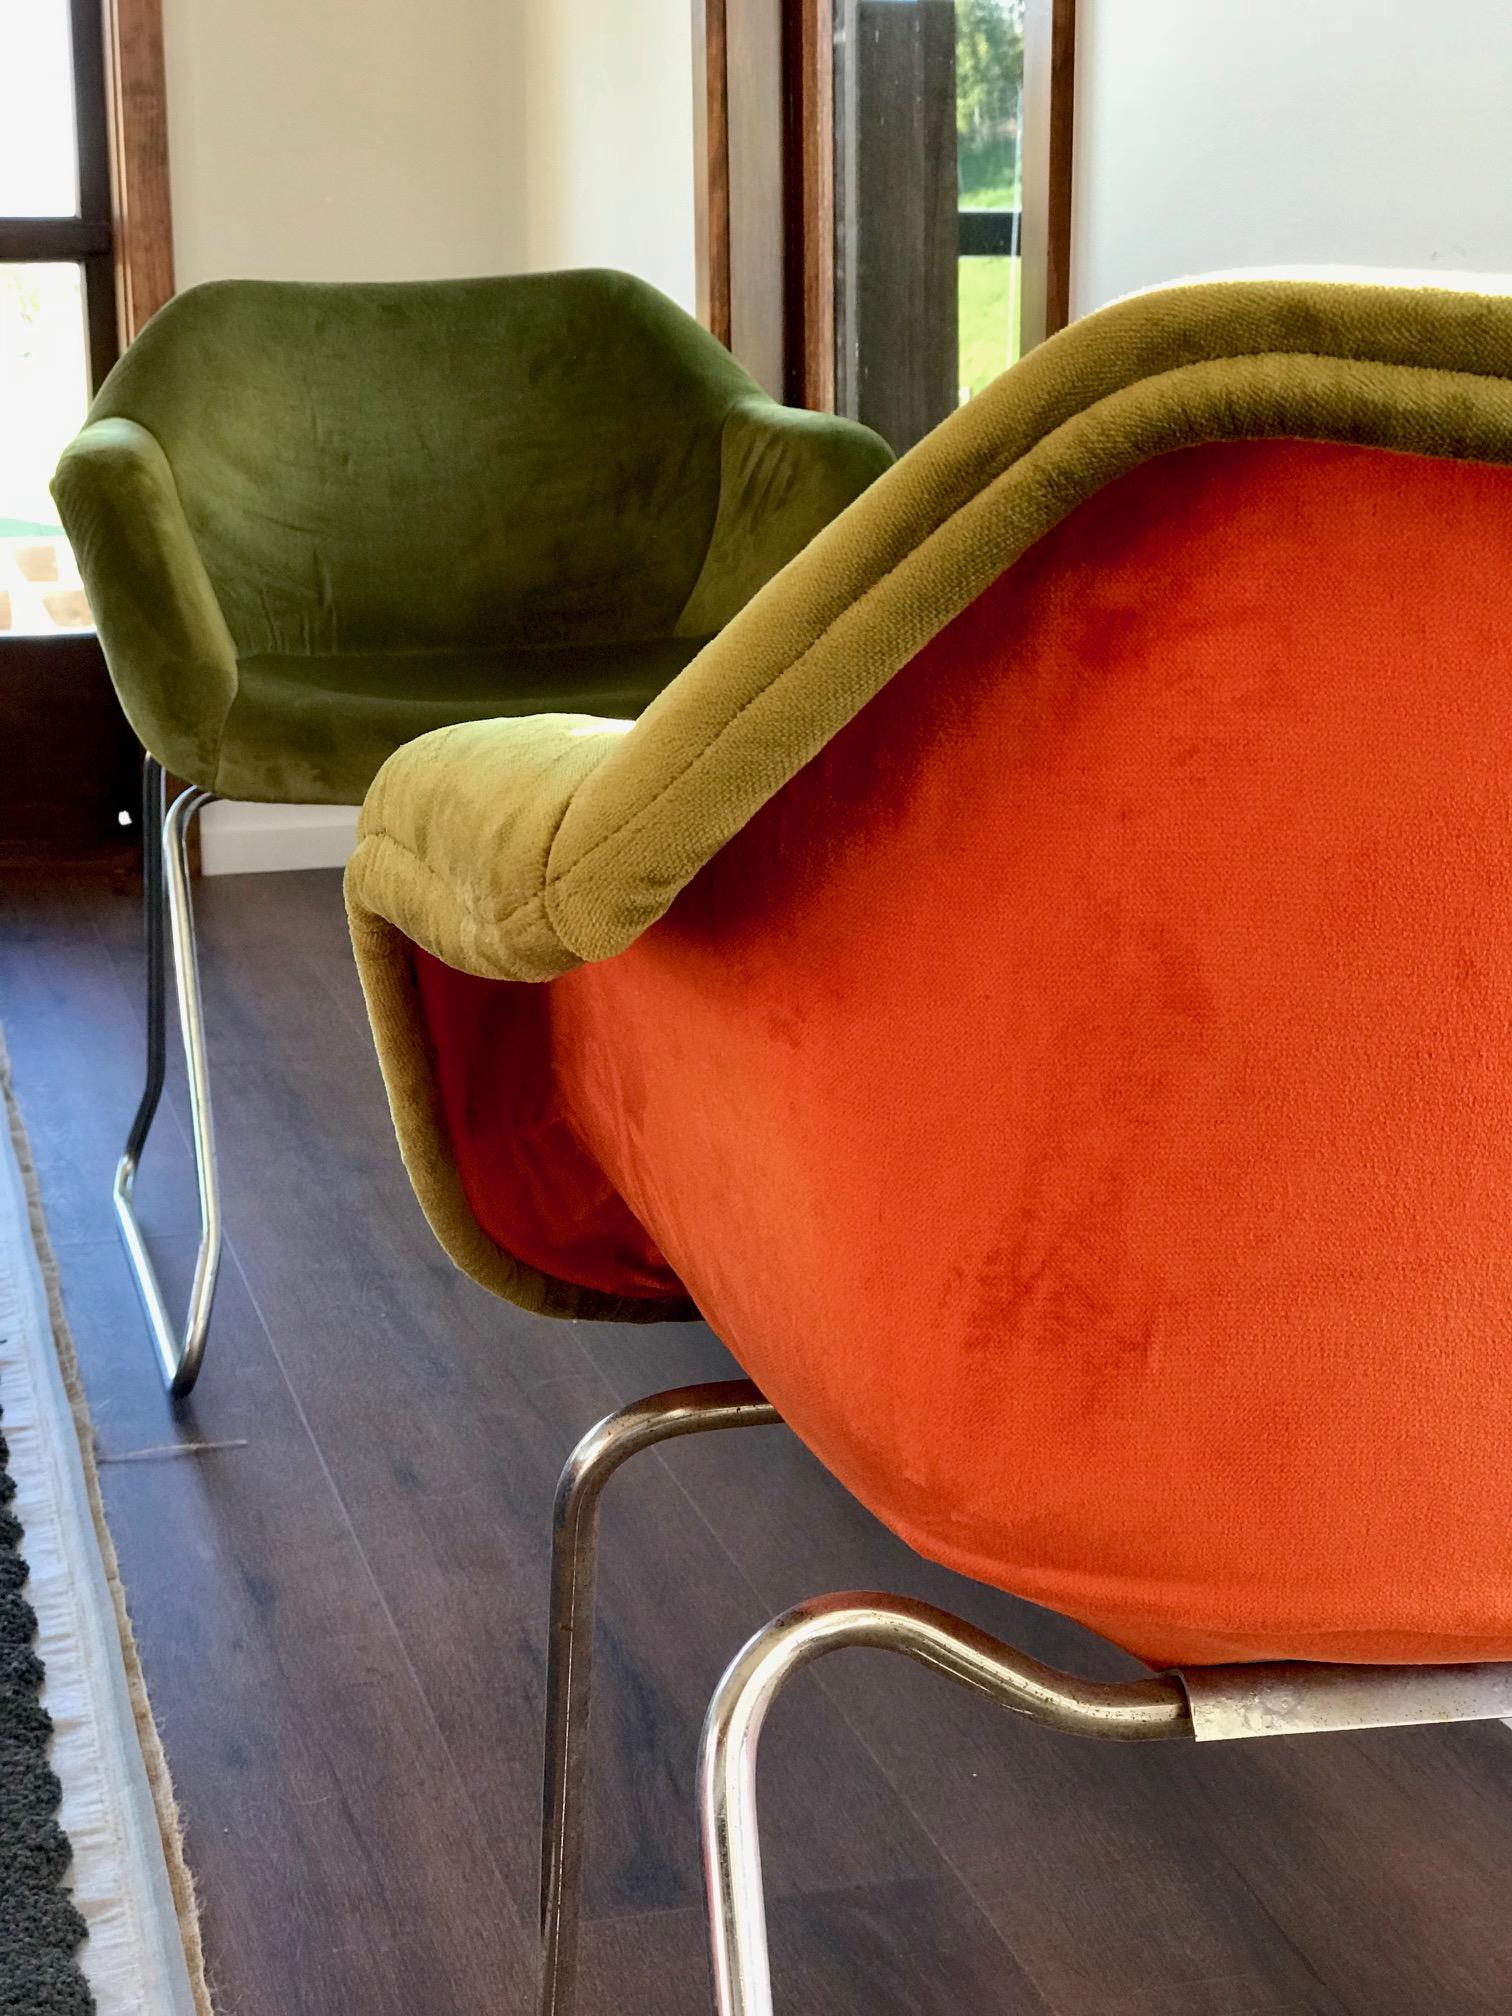 Retro Chairs in Velvet